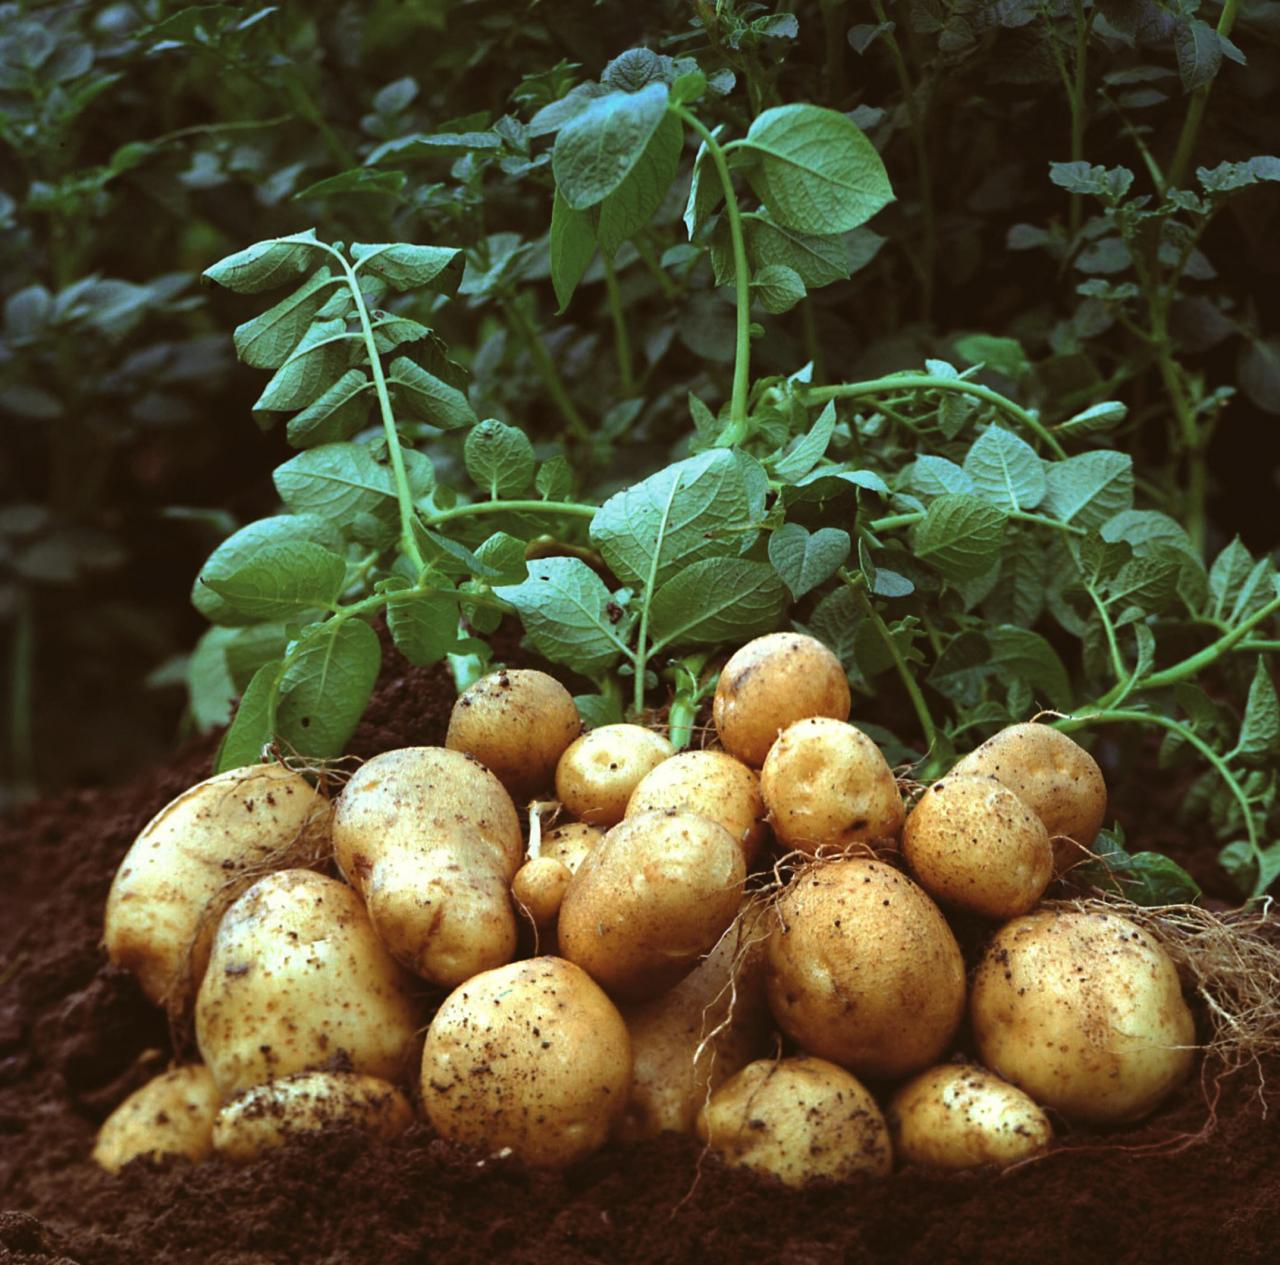 Potatoes in Majorca